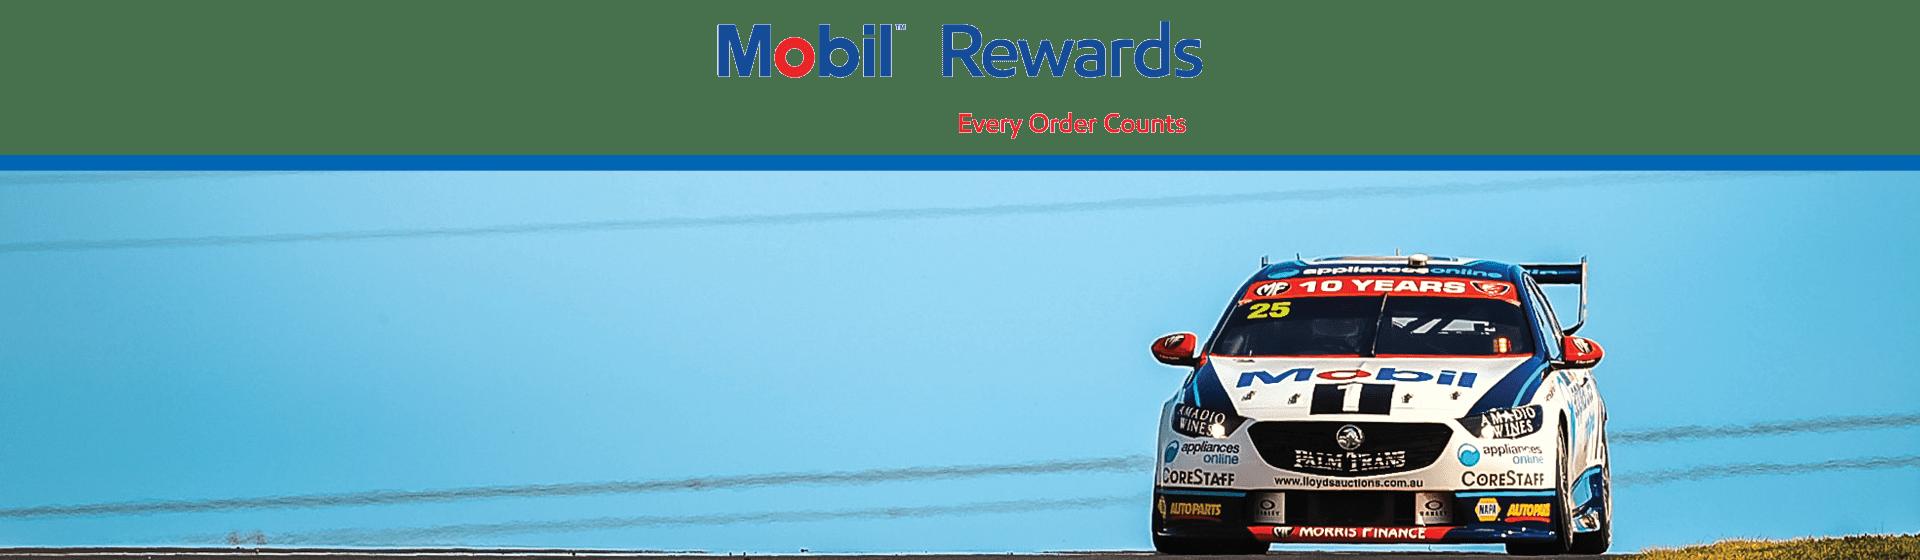 Mobil Rewardsbanner